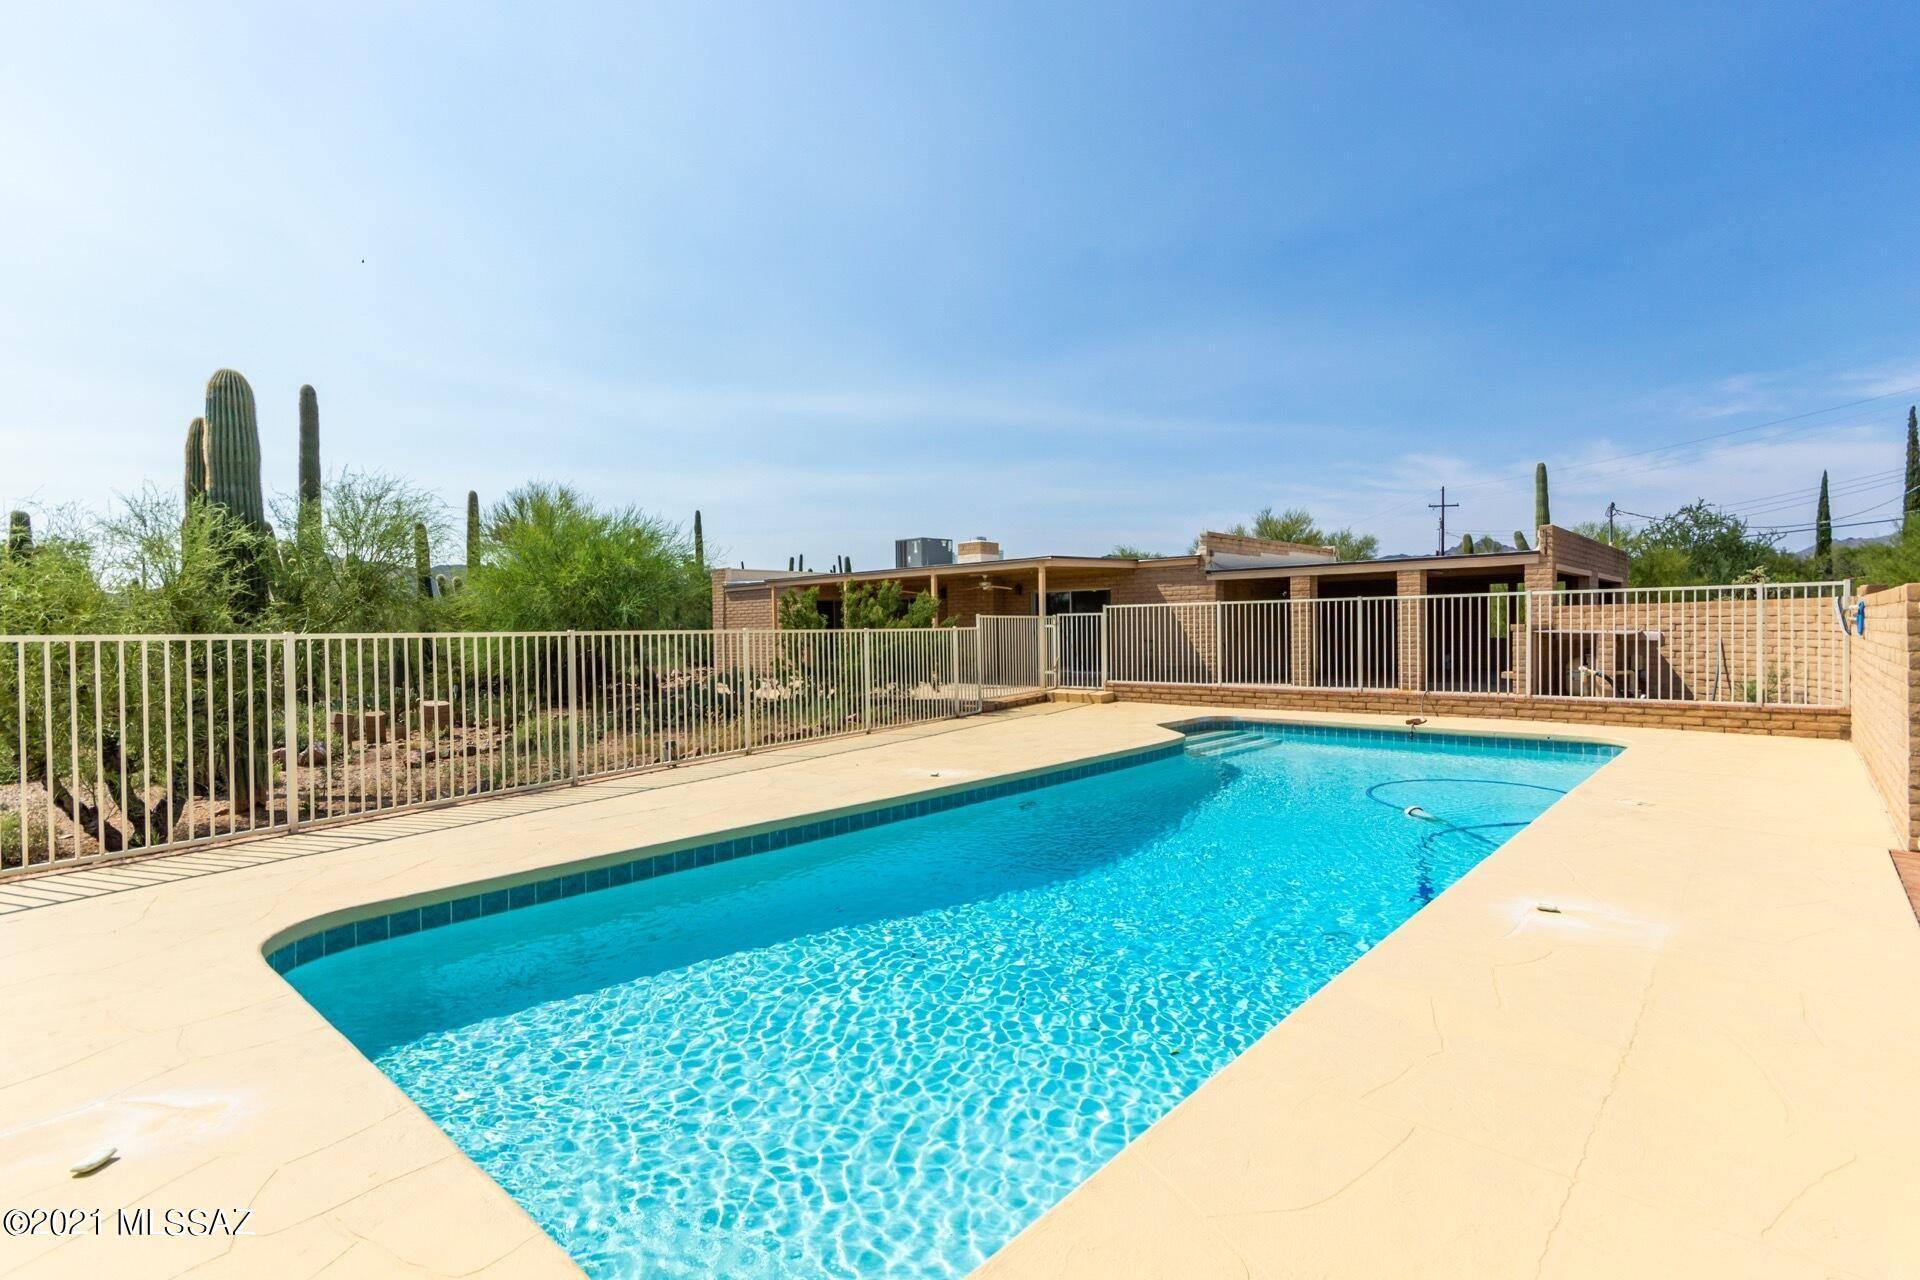 2600 N Grannen Road, Tucson, AZ 85745 – 22125321 - Team Integrity -...